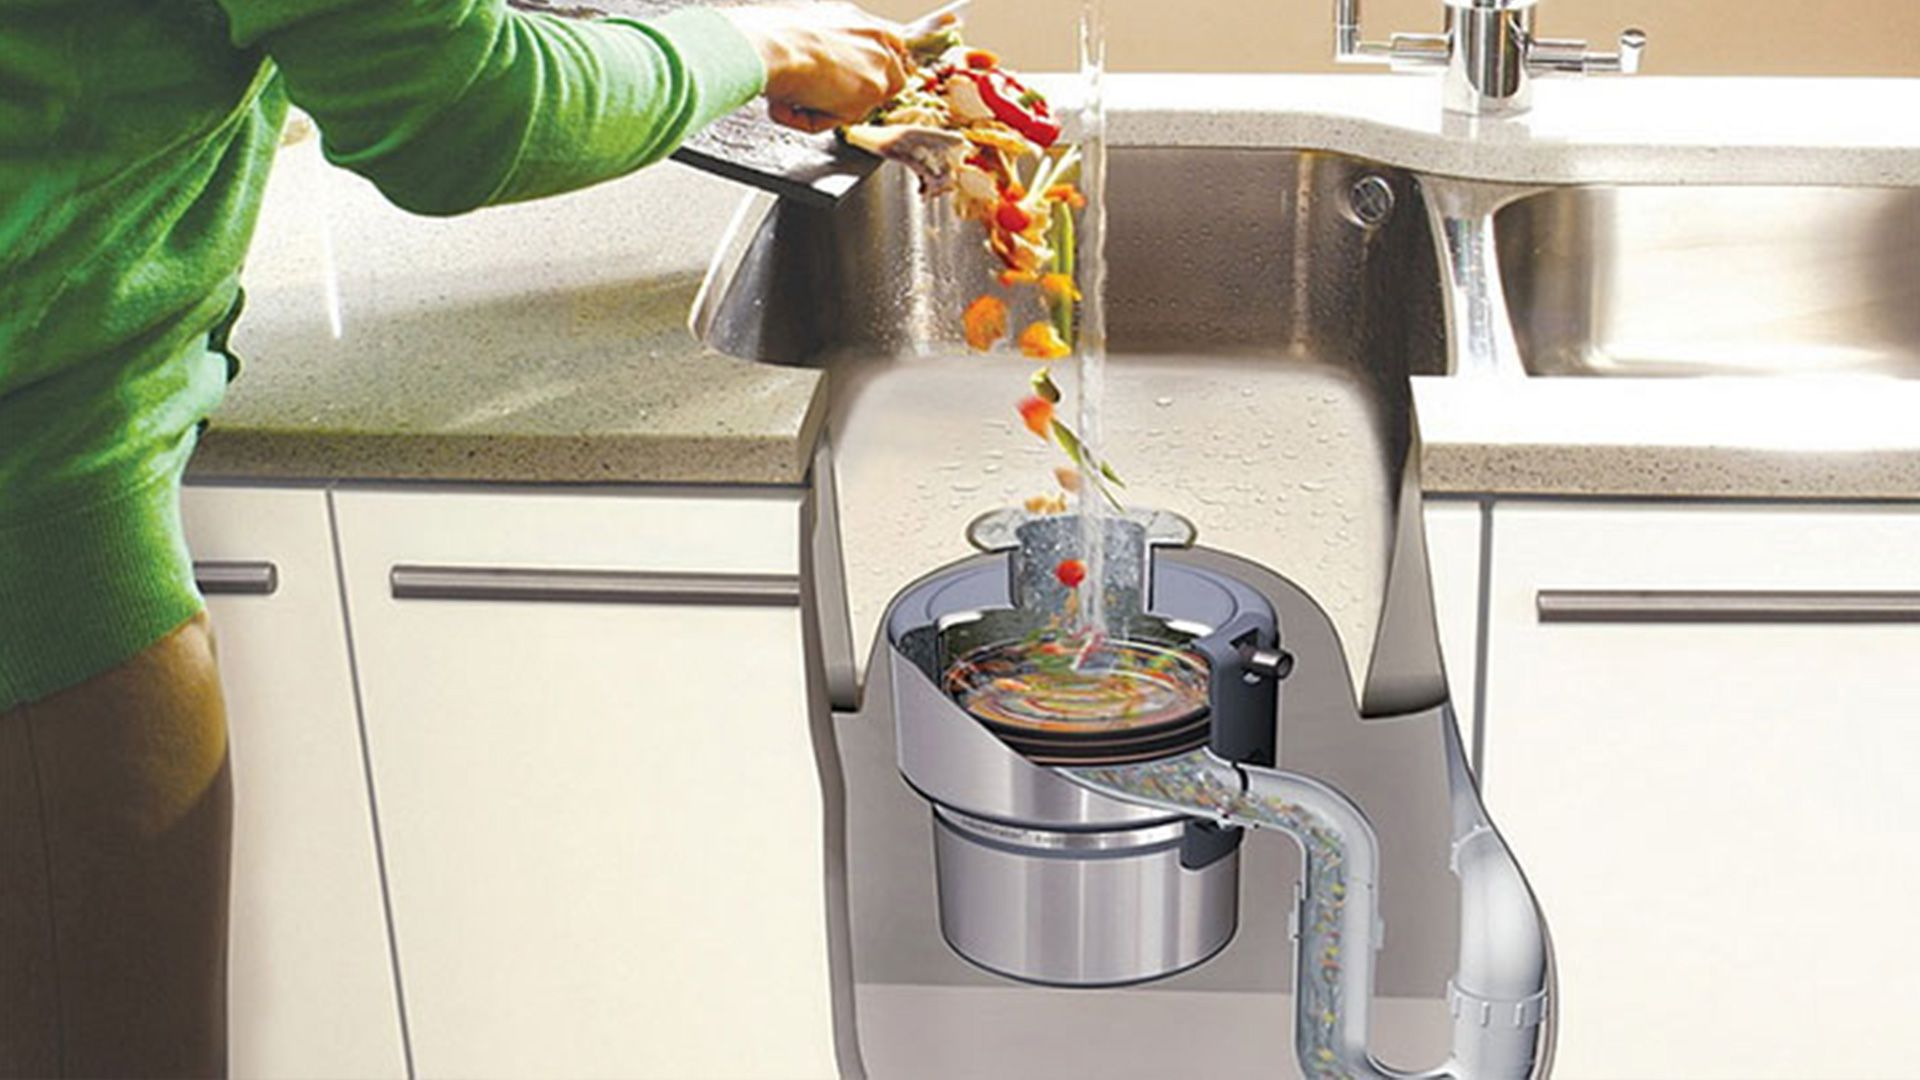 11 Best Garbage Disposals In 2020 Reviews Ing Guide